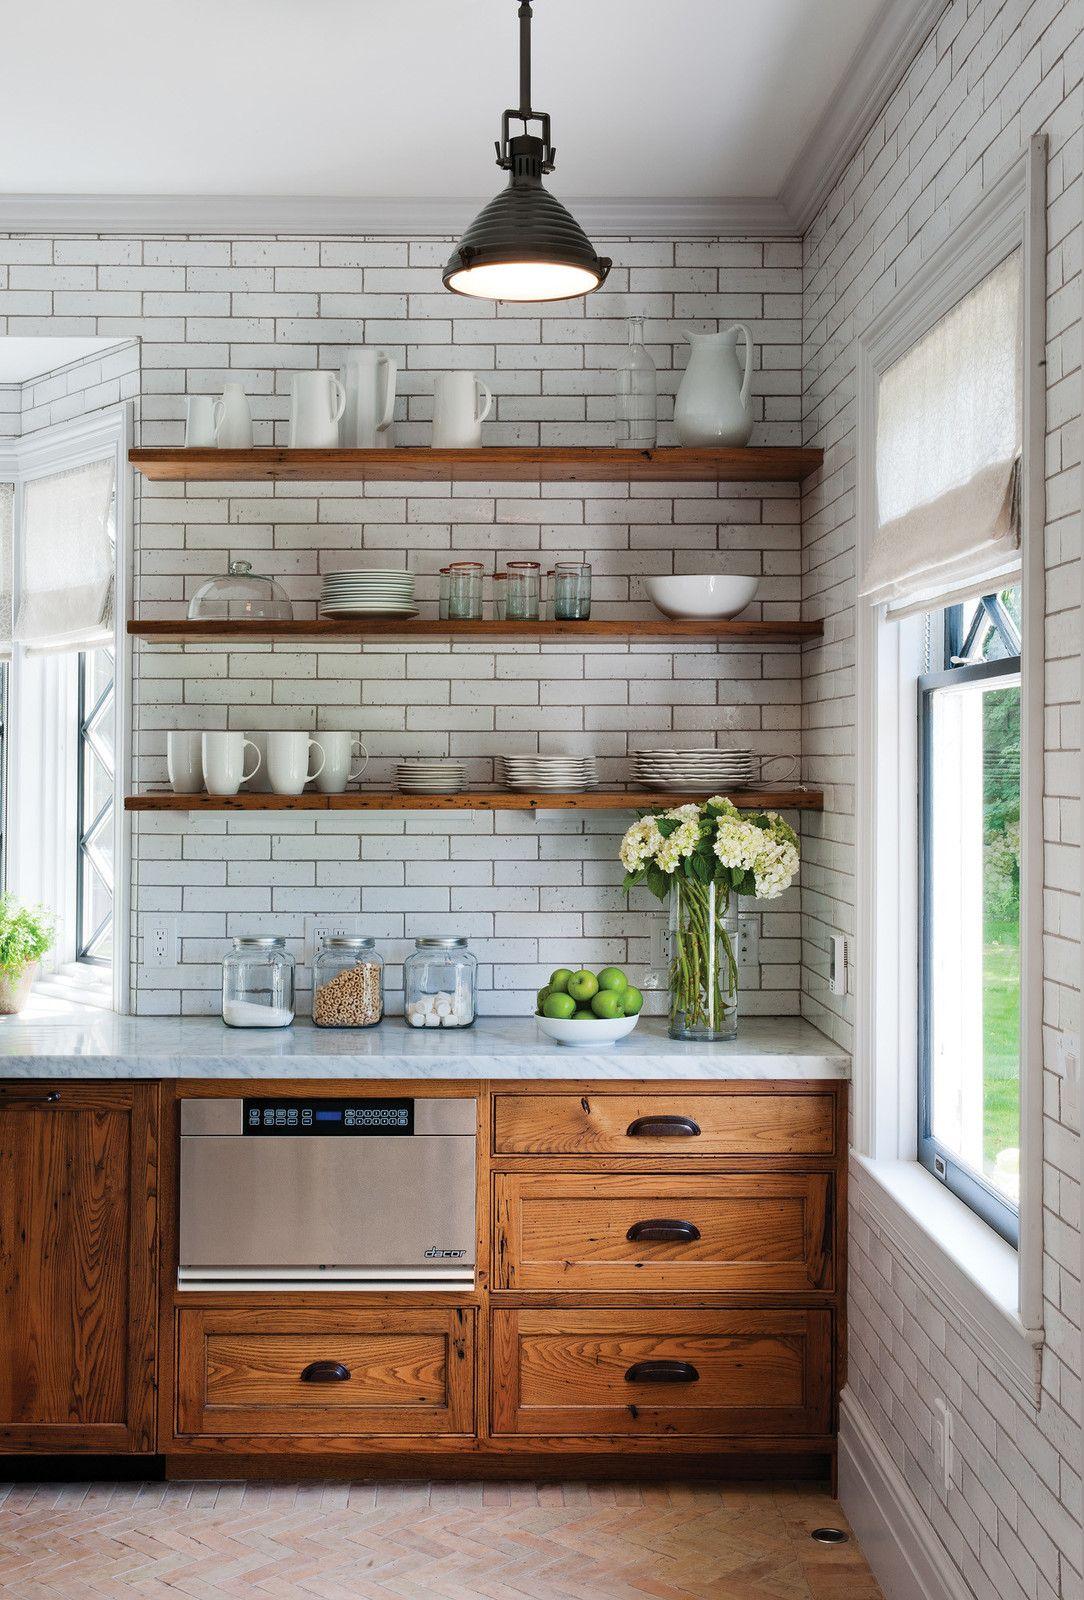 Kitchen Rustic Kitchen Idea In Burlington With Recessed Panel Cabinets Medium Tone Wood Cabinets Granit Wood Kitchen Cabinets Rustic Kitchen Kitchen Design